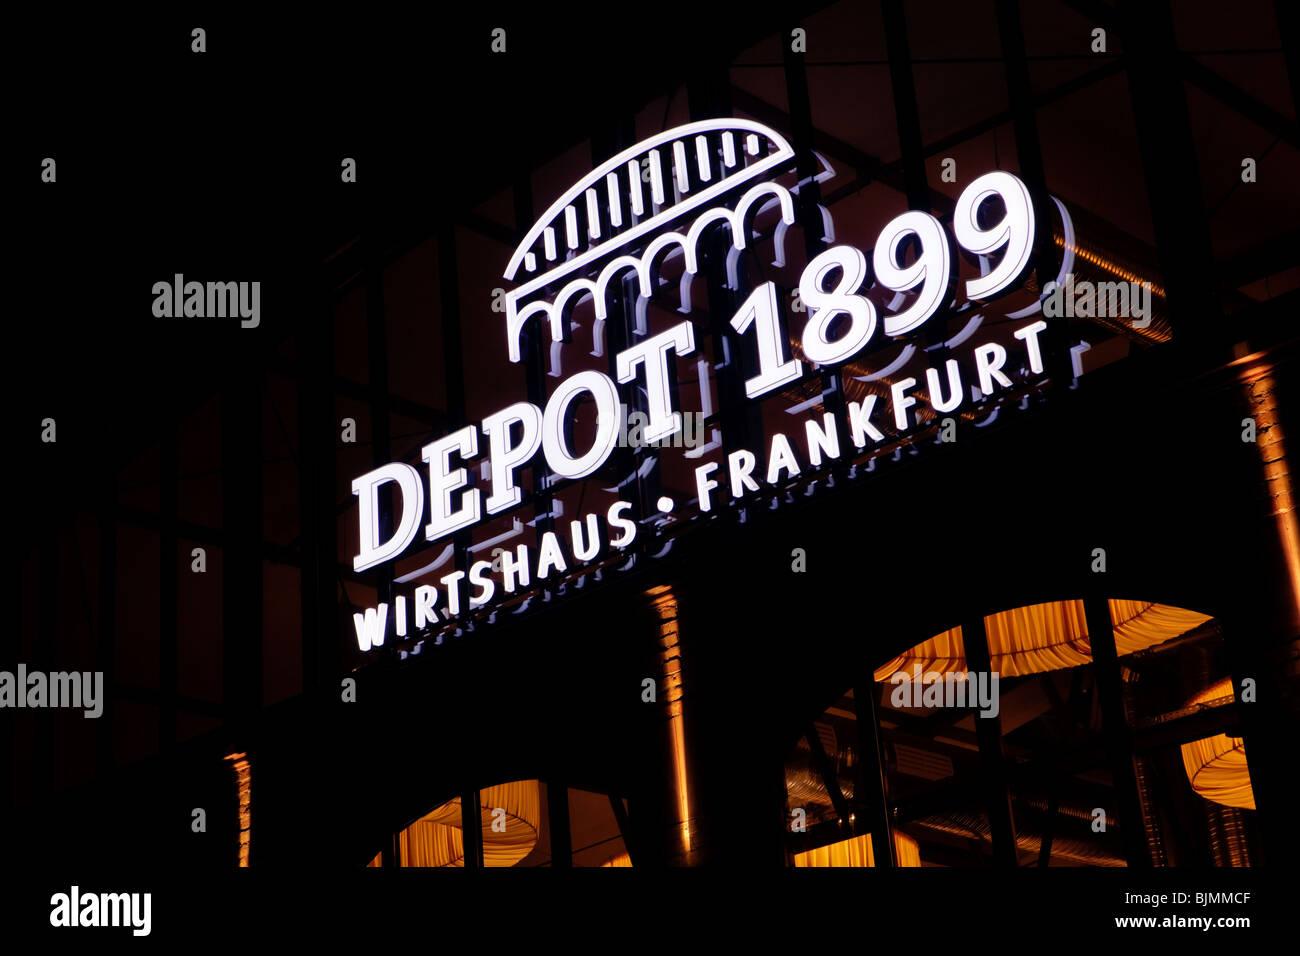 Das Depot 1899 Frankfurt Traditionsgasthaus Textorstrasse Straße